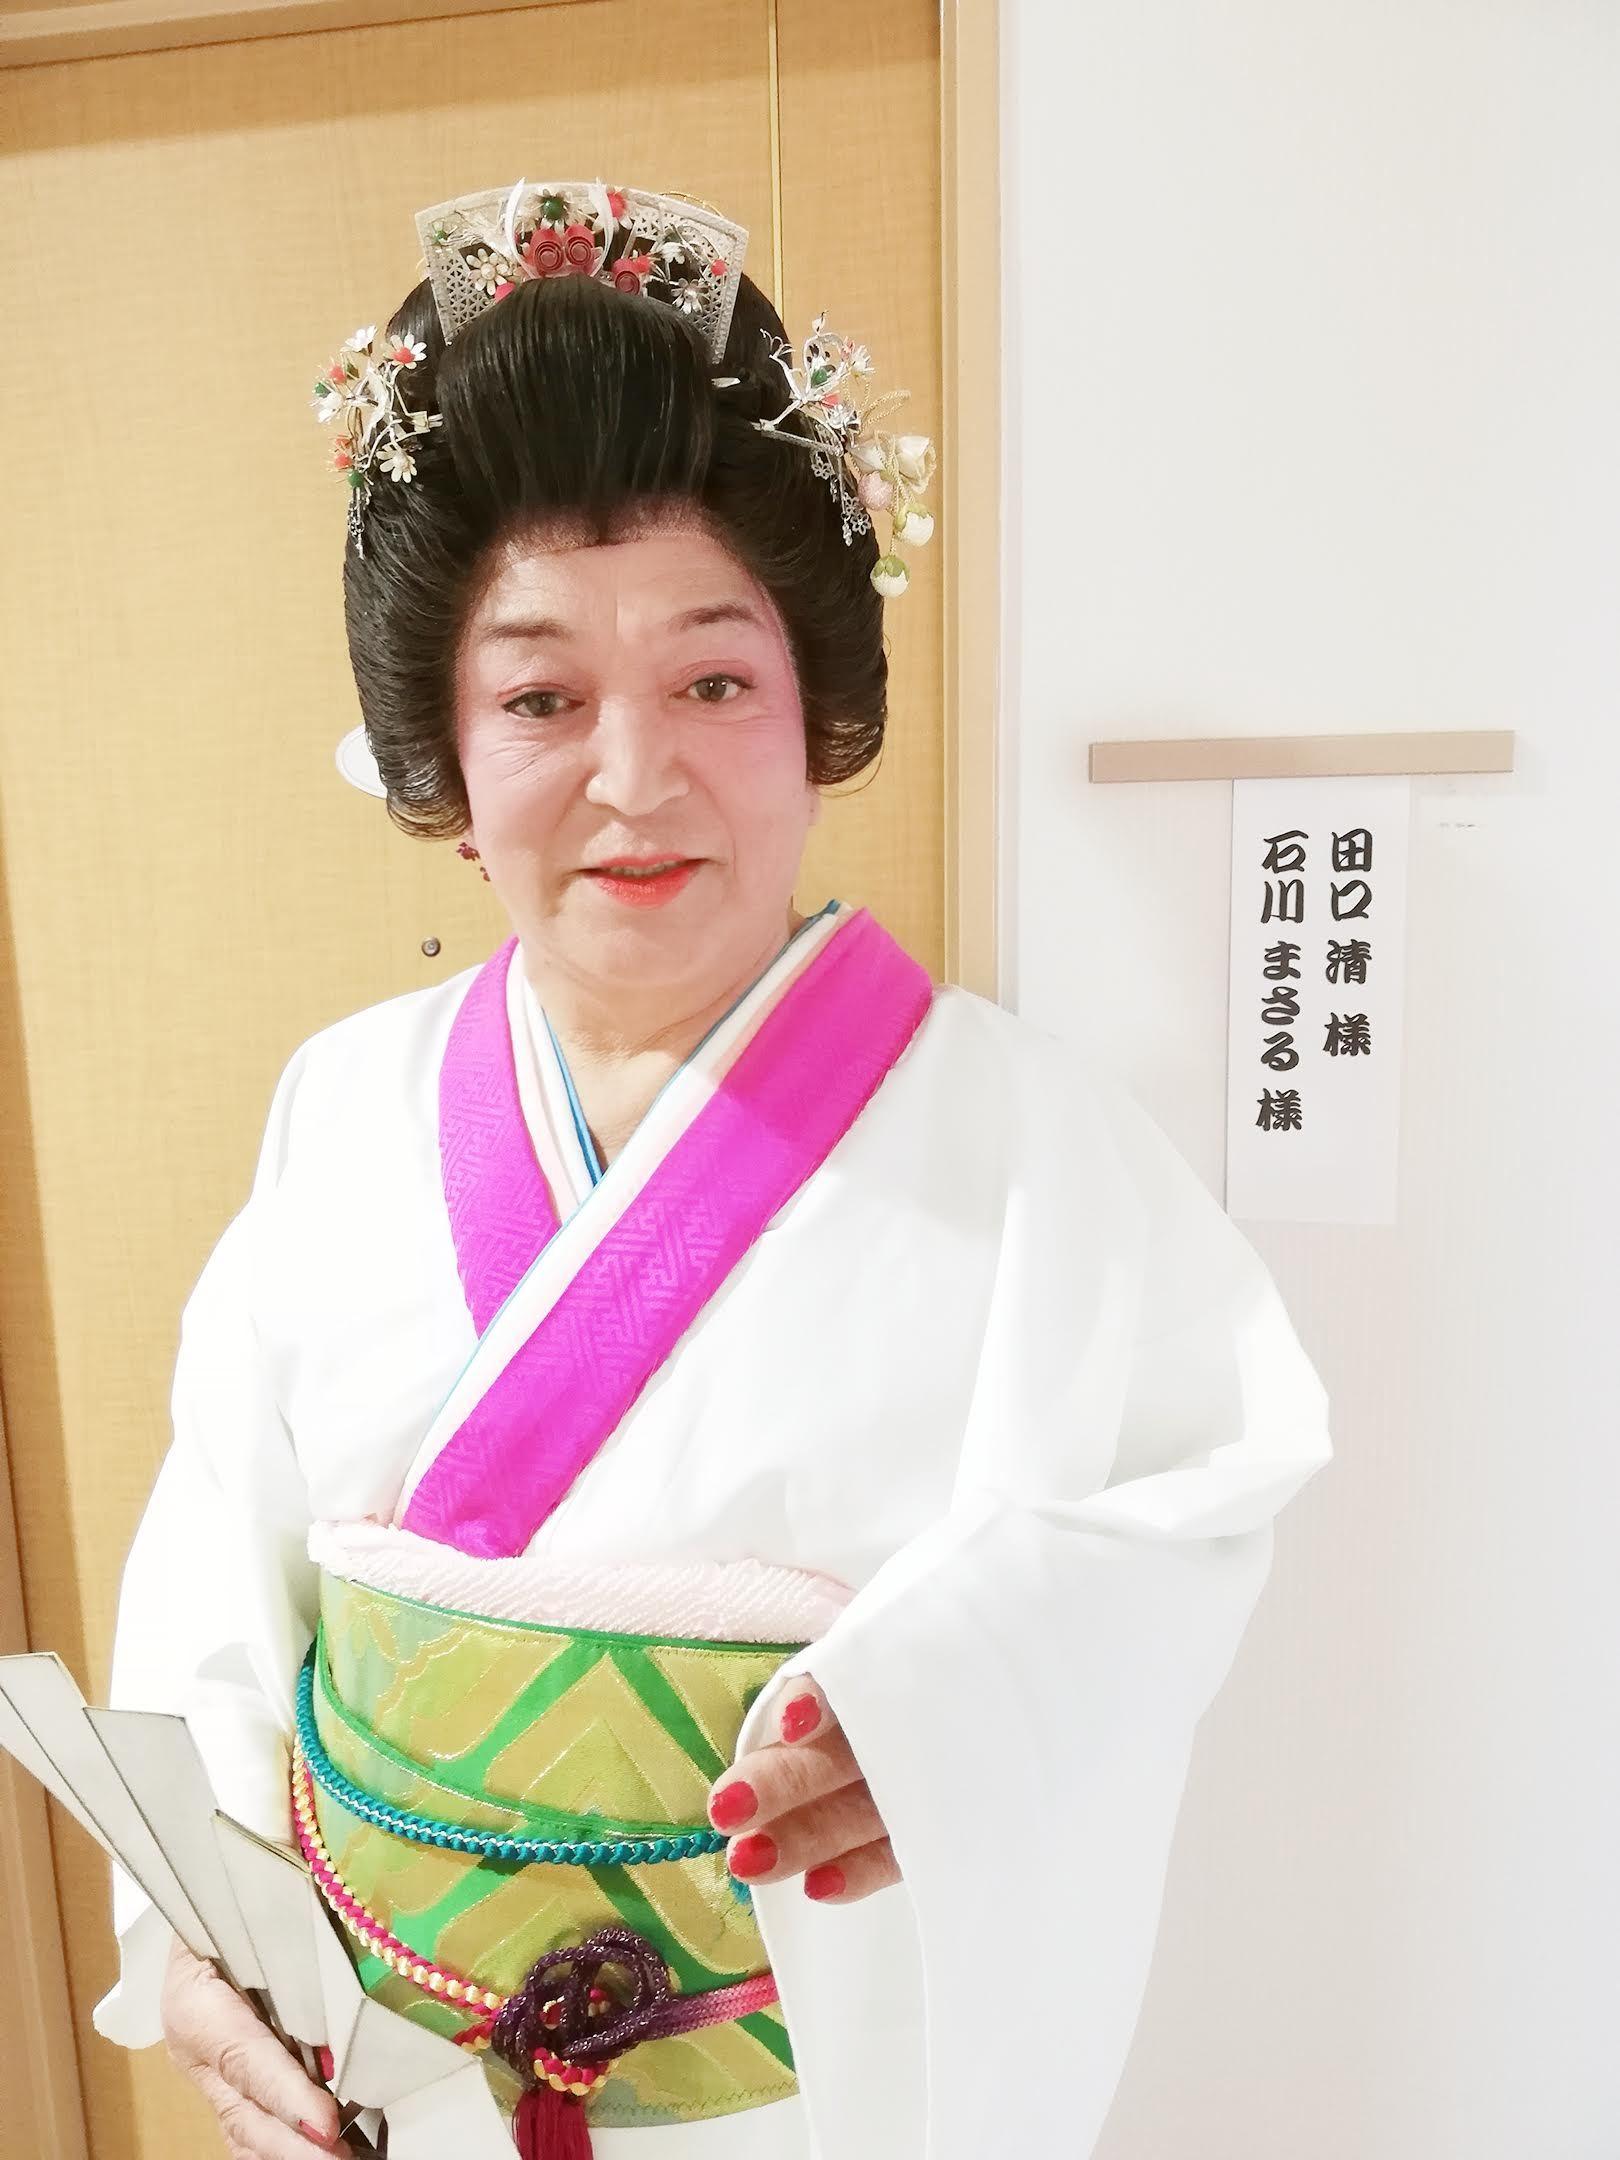 H31.4/6(土) かみす桜まつりイベント開催!_f0229750_16042204.jpg